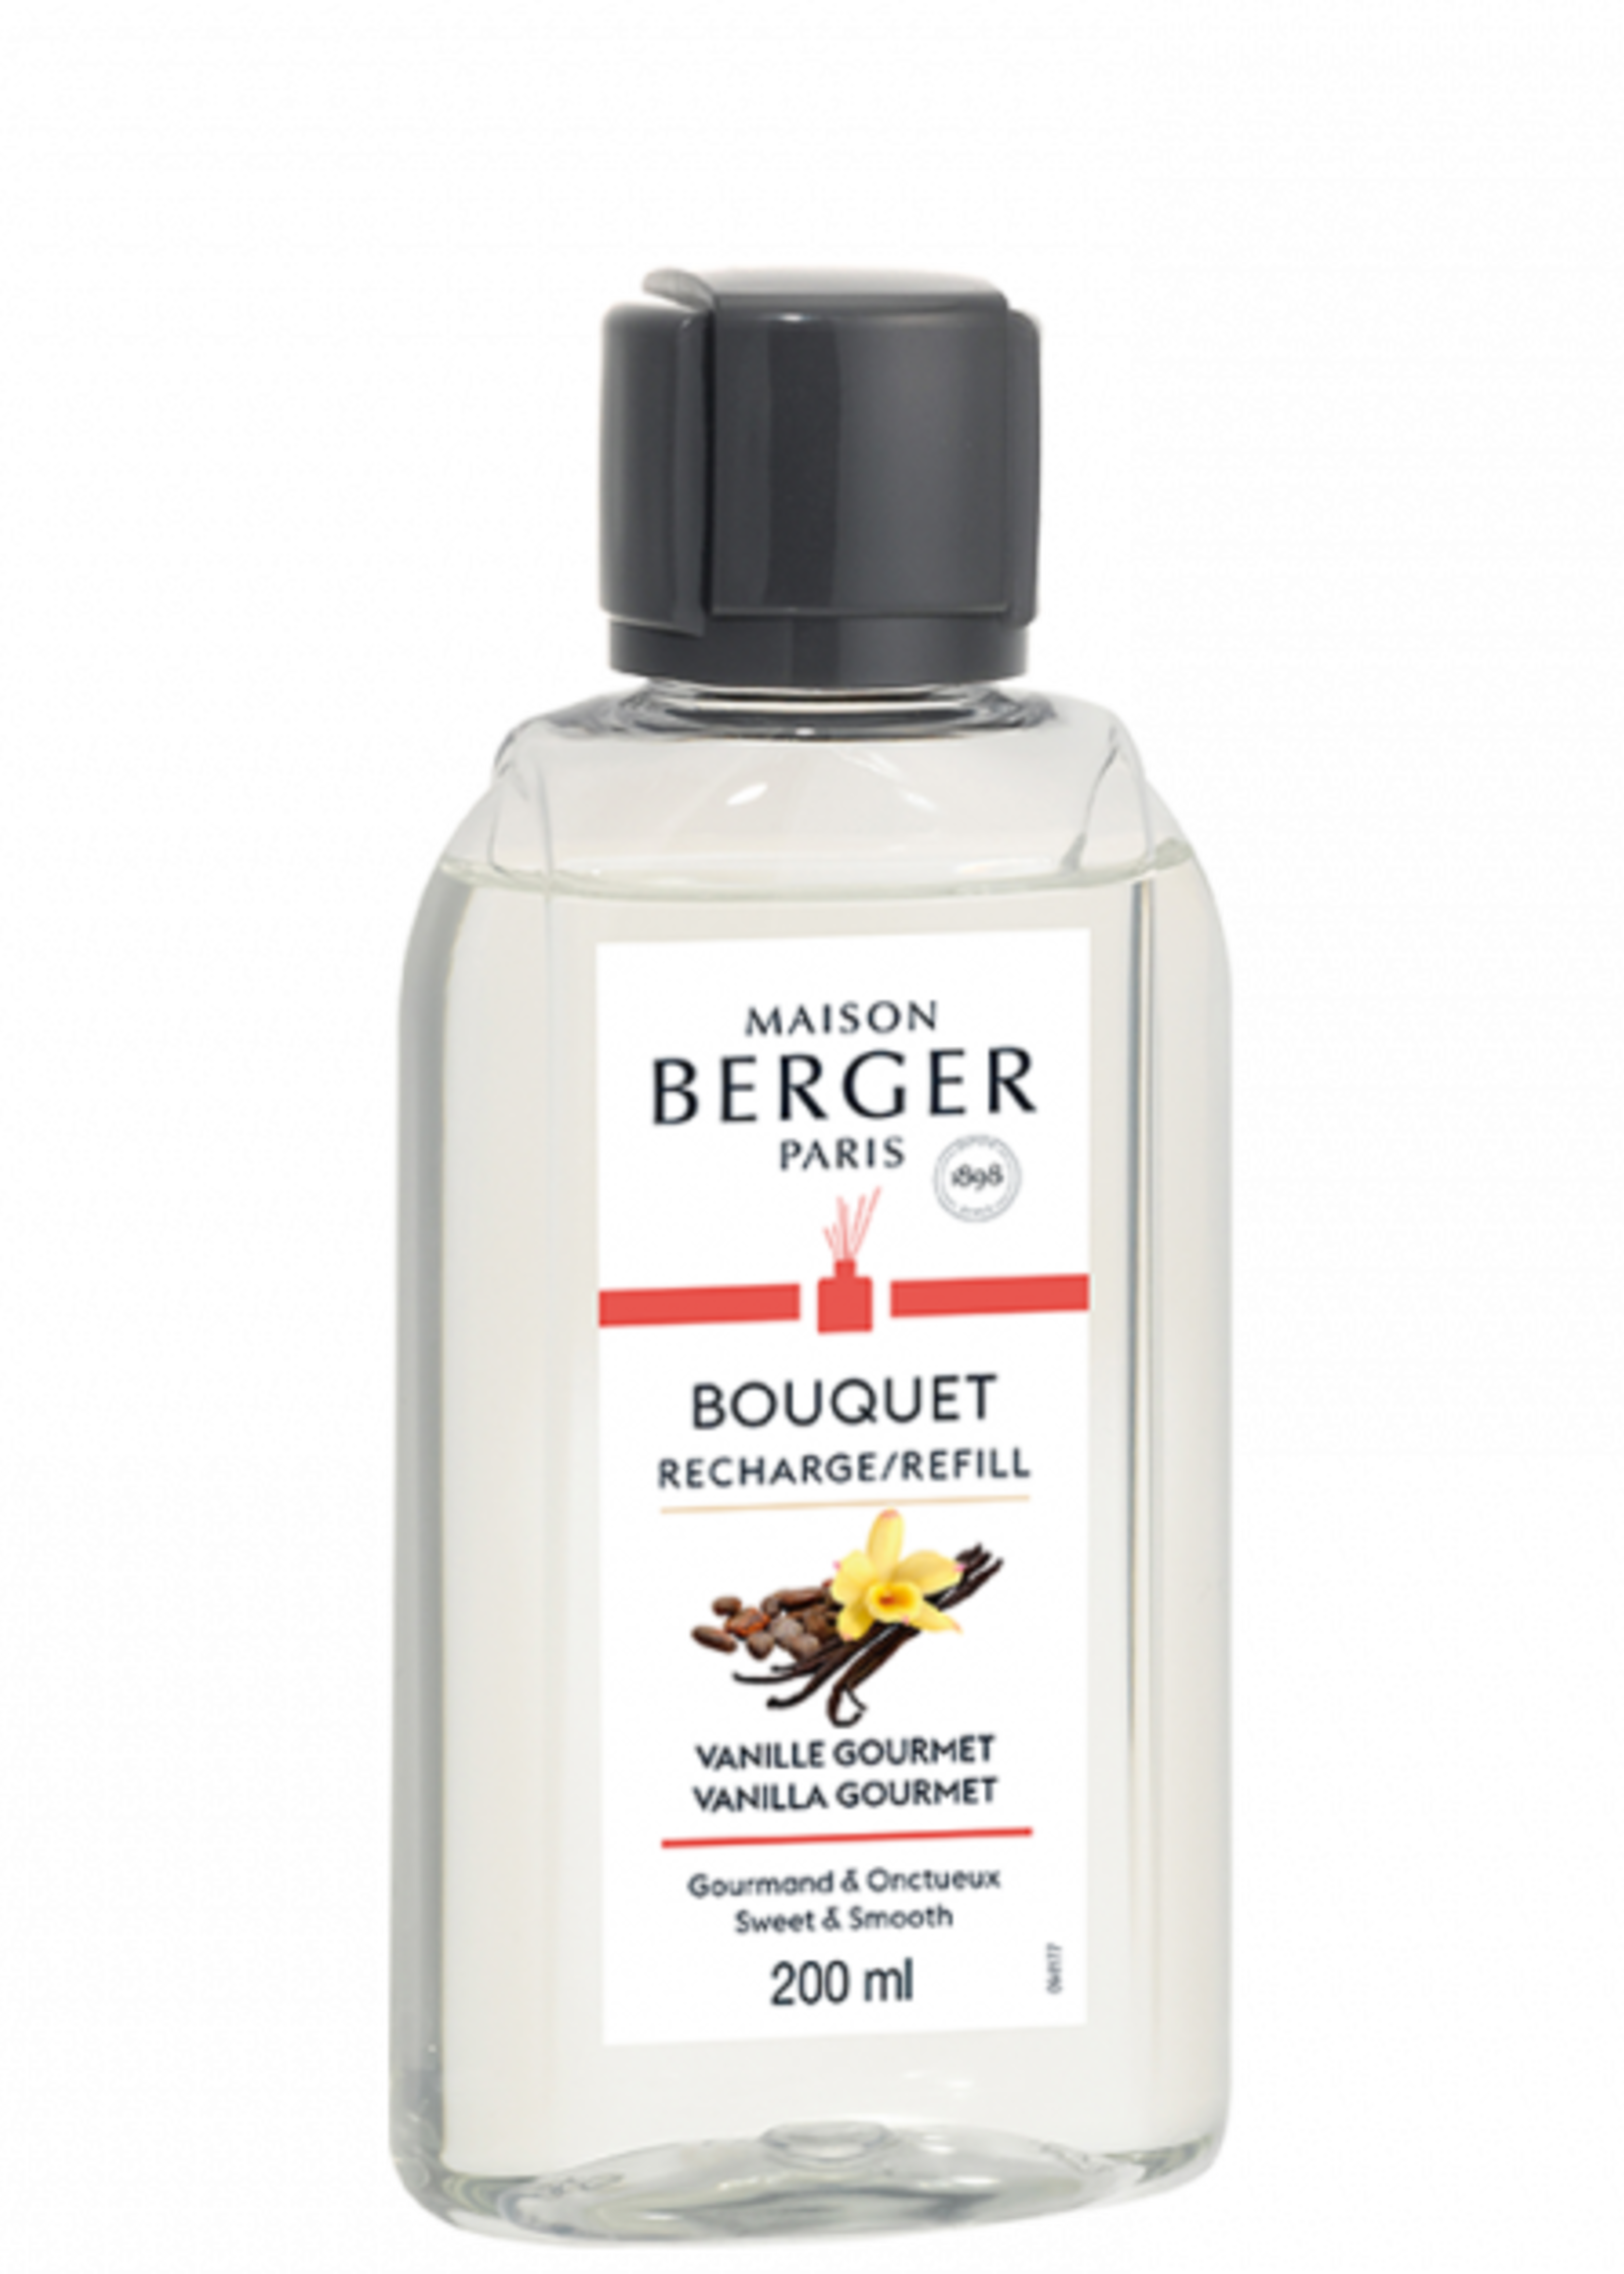 Parfum de Berger Navulling  Parfumverspreider Vanille Gourmet